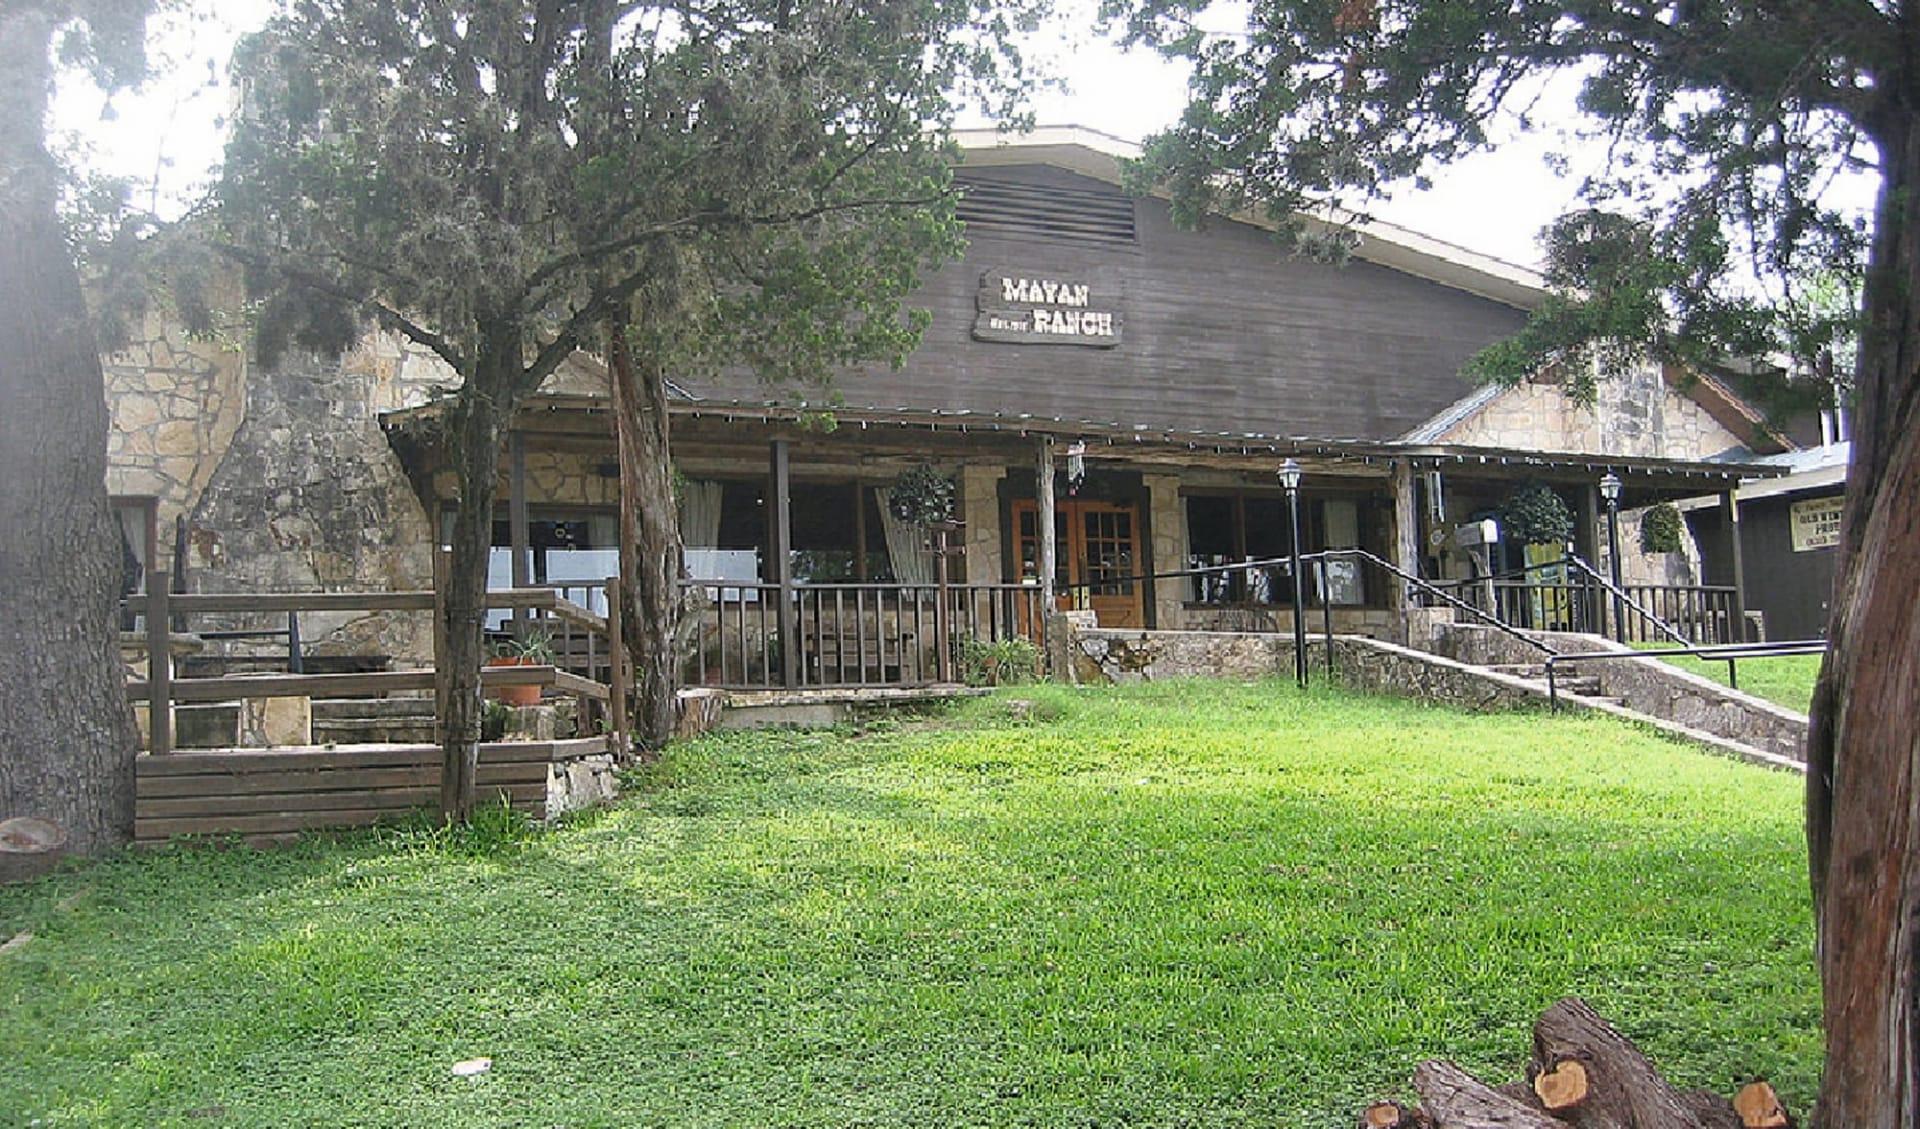 Mayan Dude Ranch in Bandera: exterior mayan dude ranchtexas ranchansicht